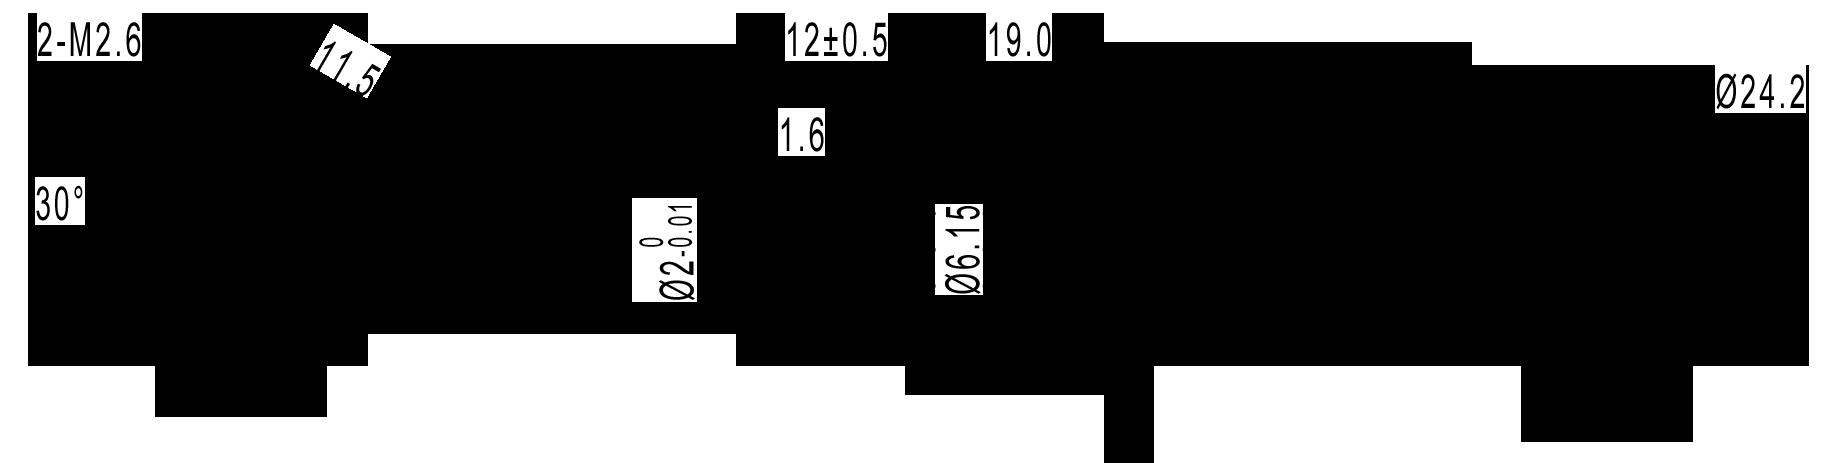 tec驱动电路系统框图